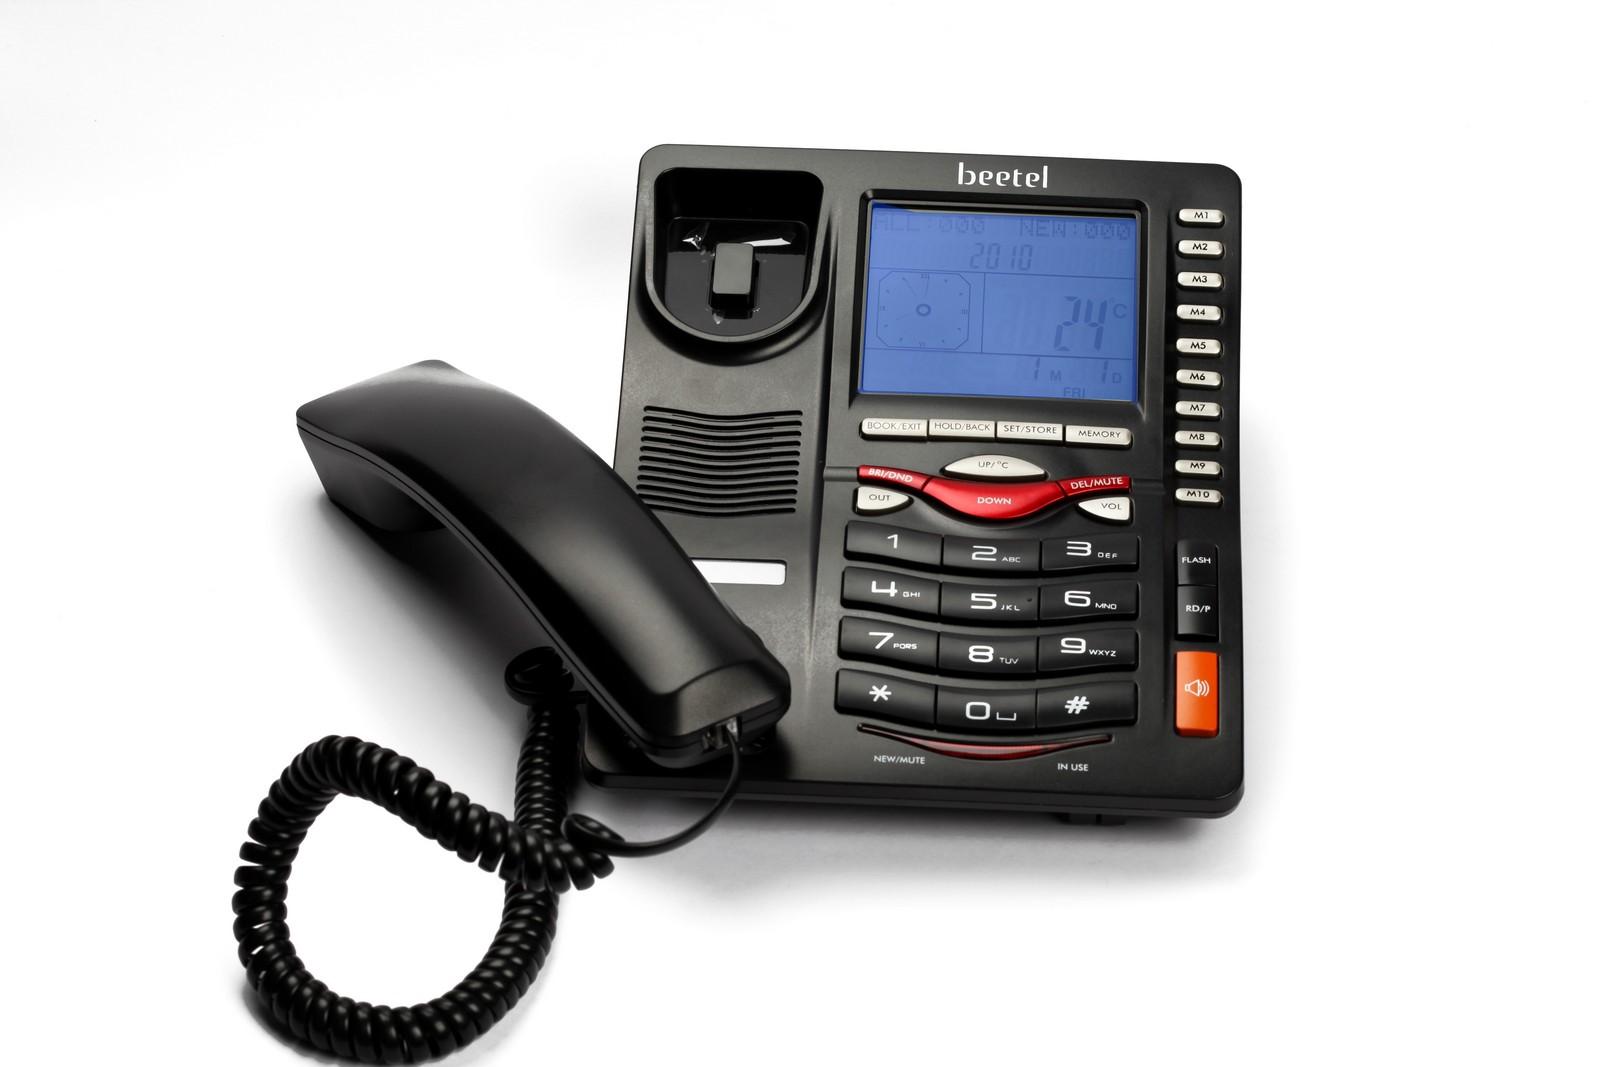 31680ba334d Buy Beetel Corded Landline Phone (Black) - M75 Online in India at Best  Prices